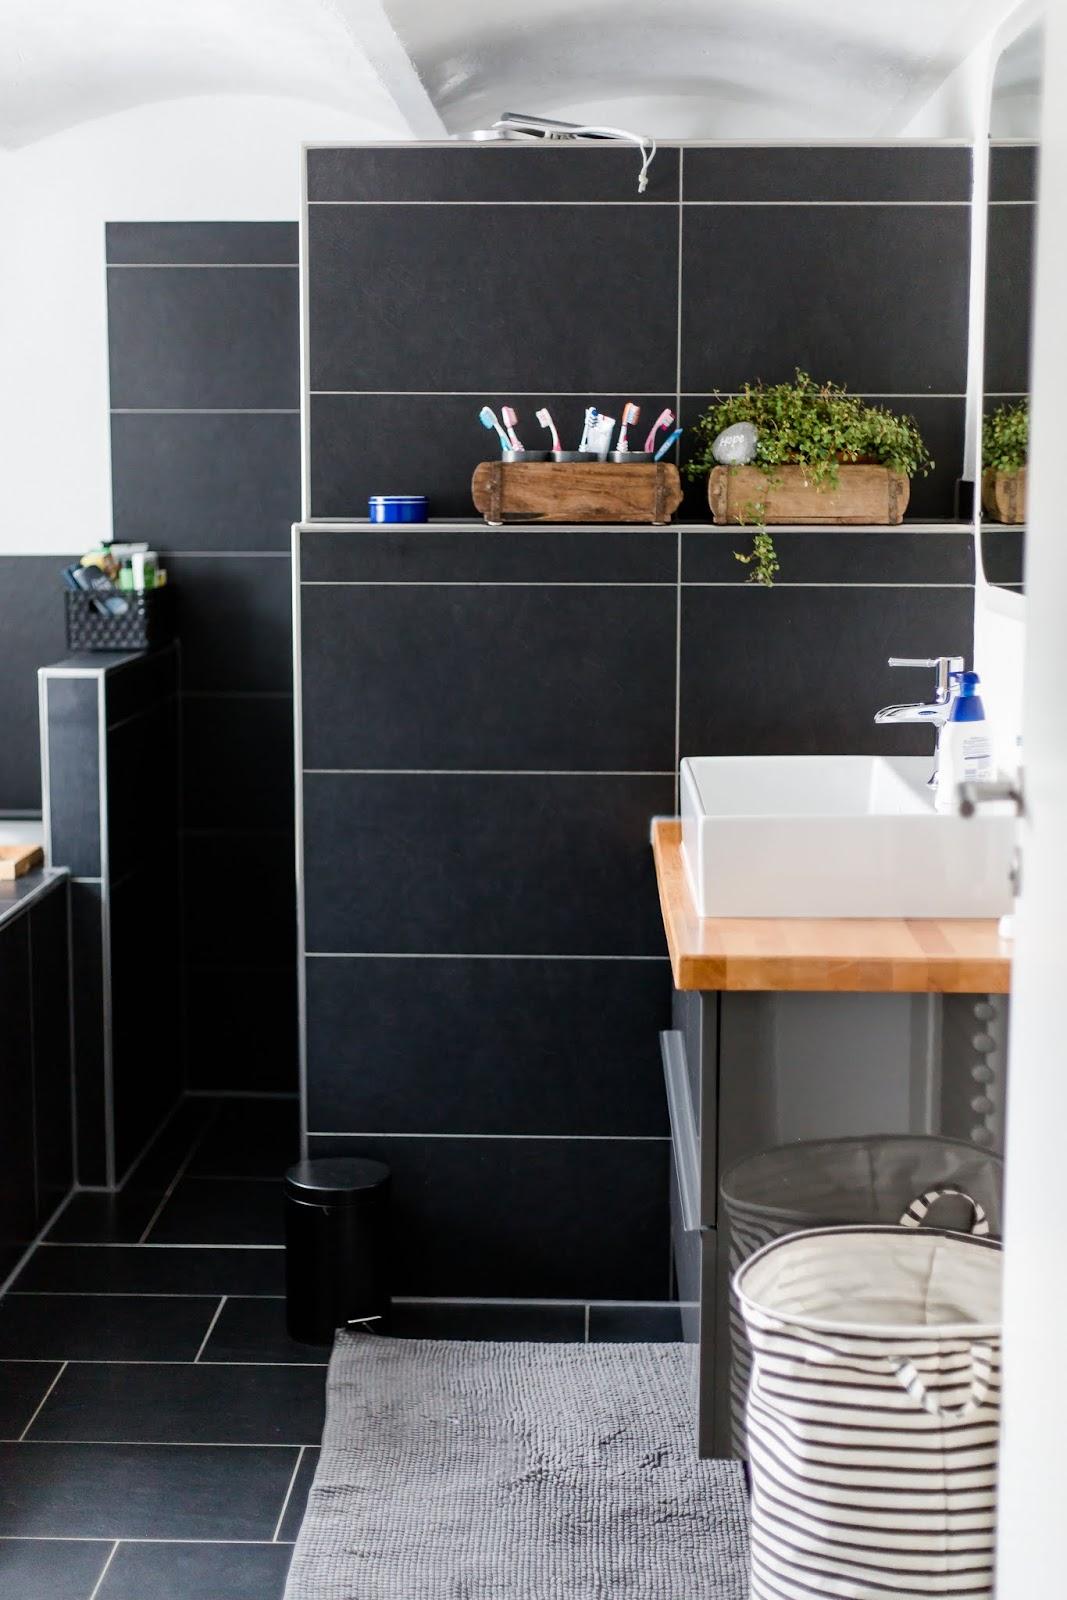 bad fenster nass verschiedene ideen f r die raumgestaltung inspiration. Black Bedroom Furniture Sets. Home Design Ideas